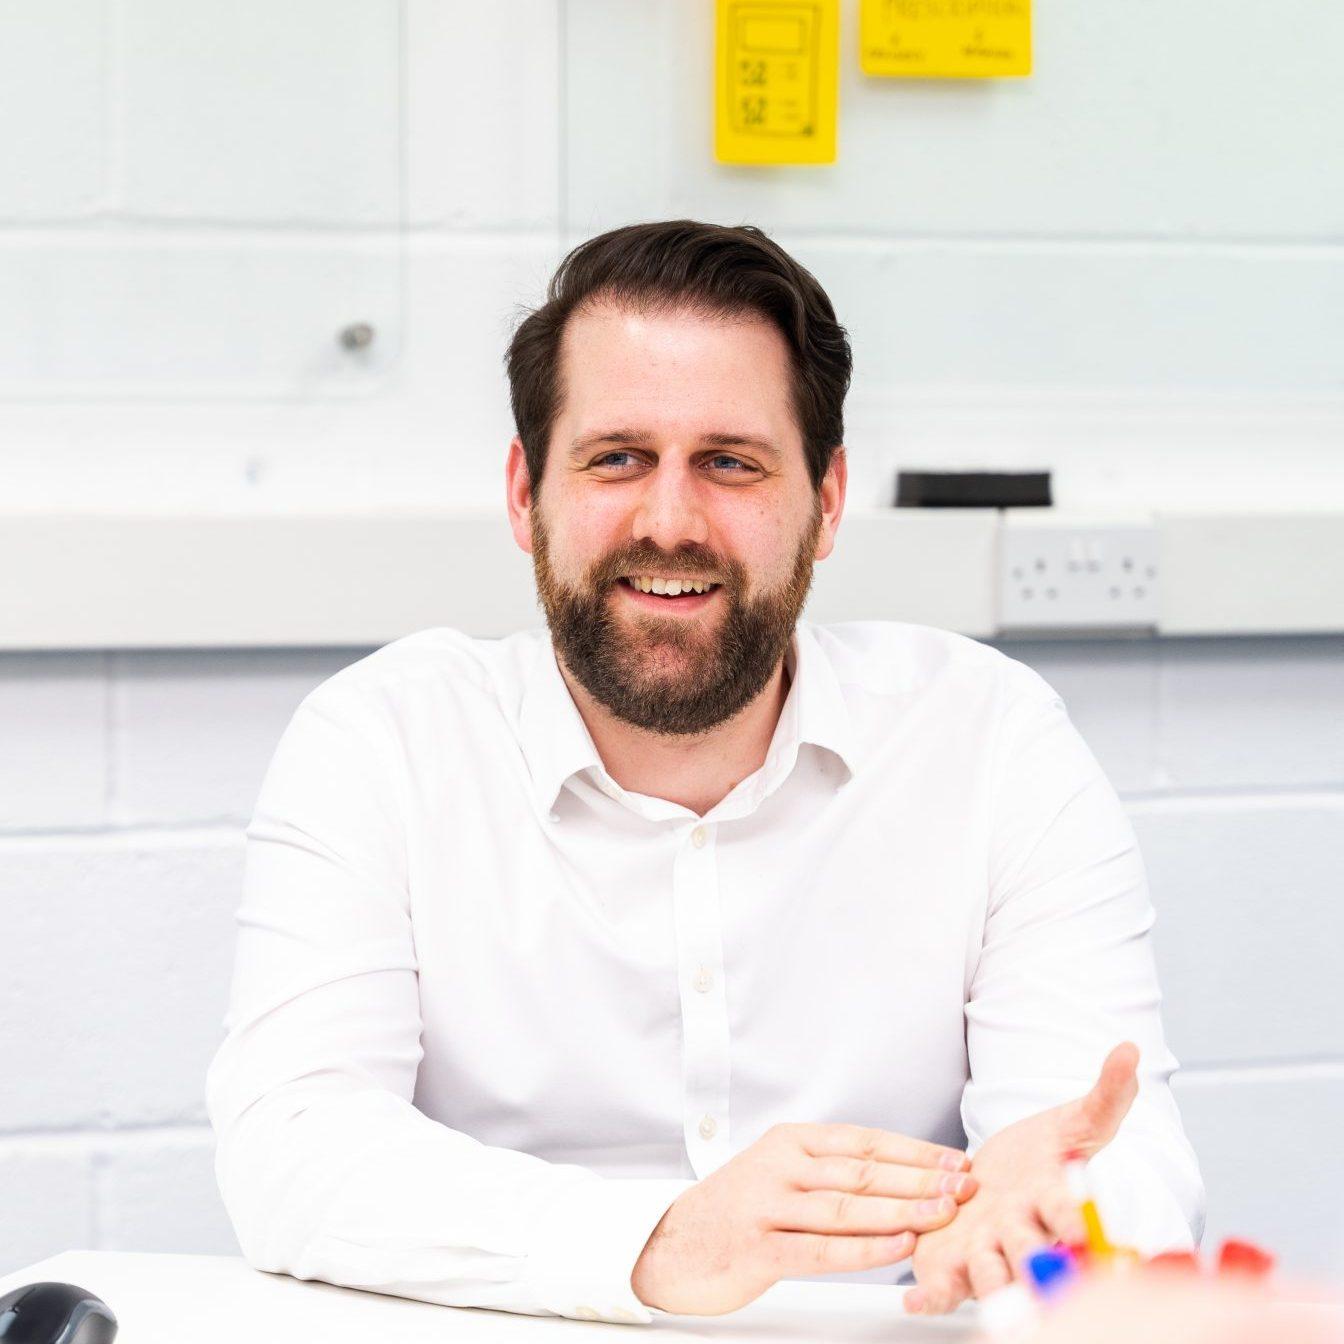 Medical Design Development Engineer, Danny in a team meeting in a design studio